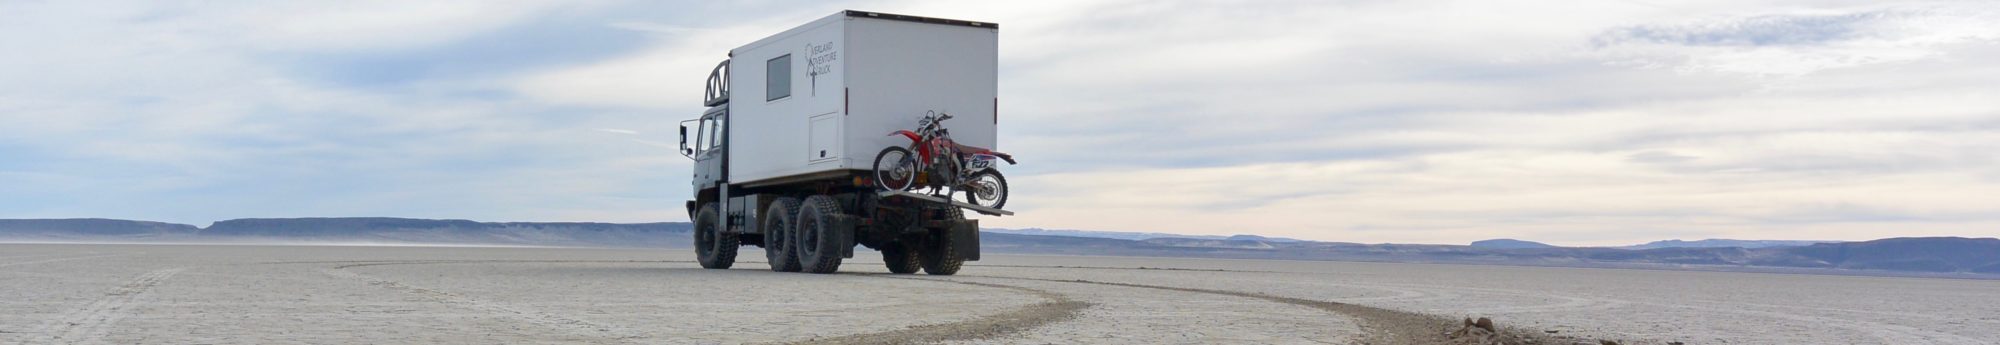 Overland Adventure Truck